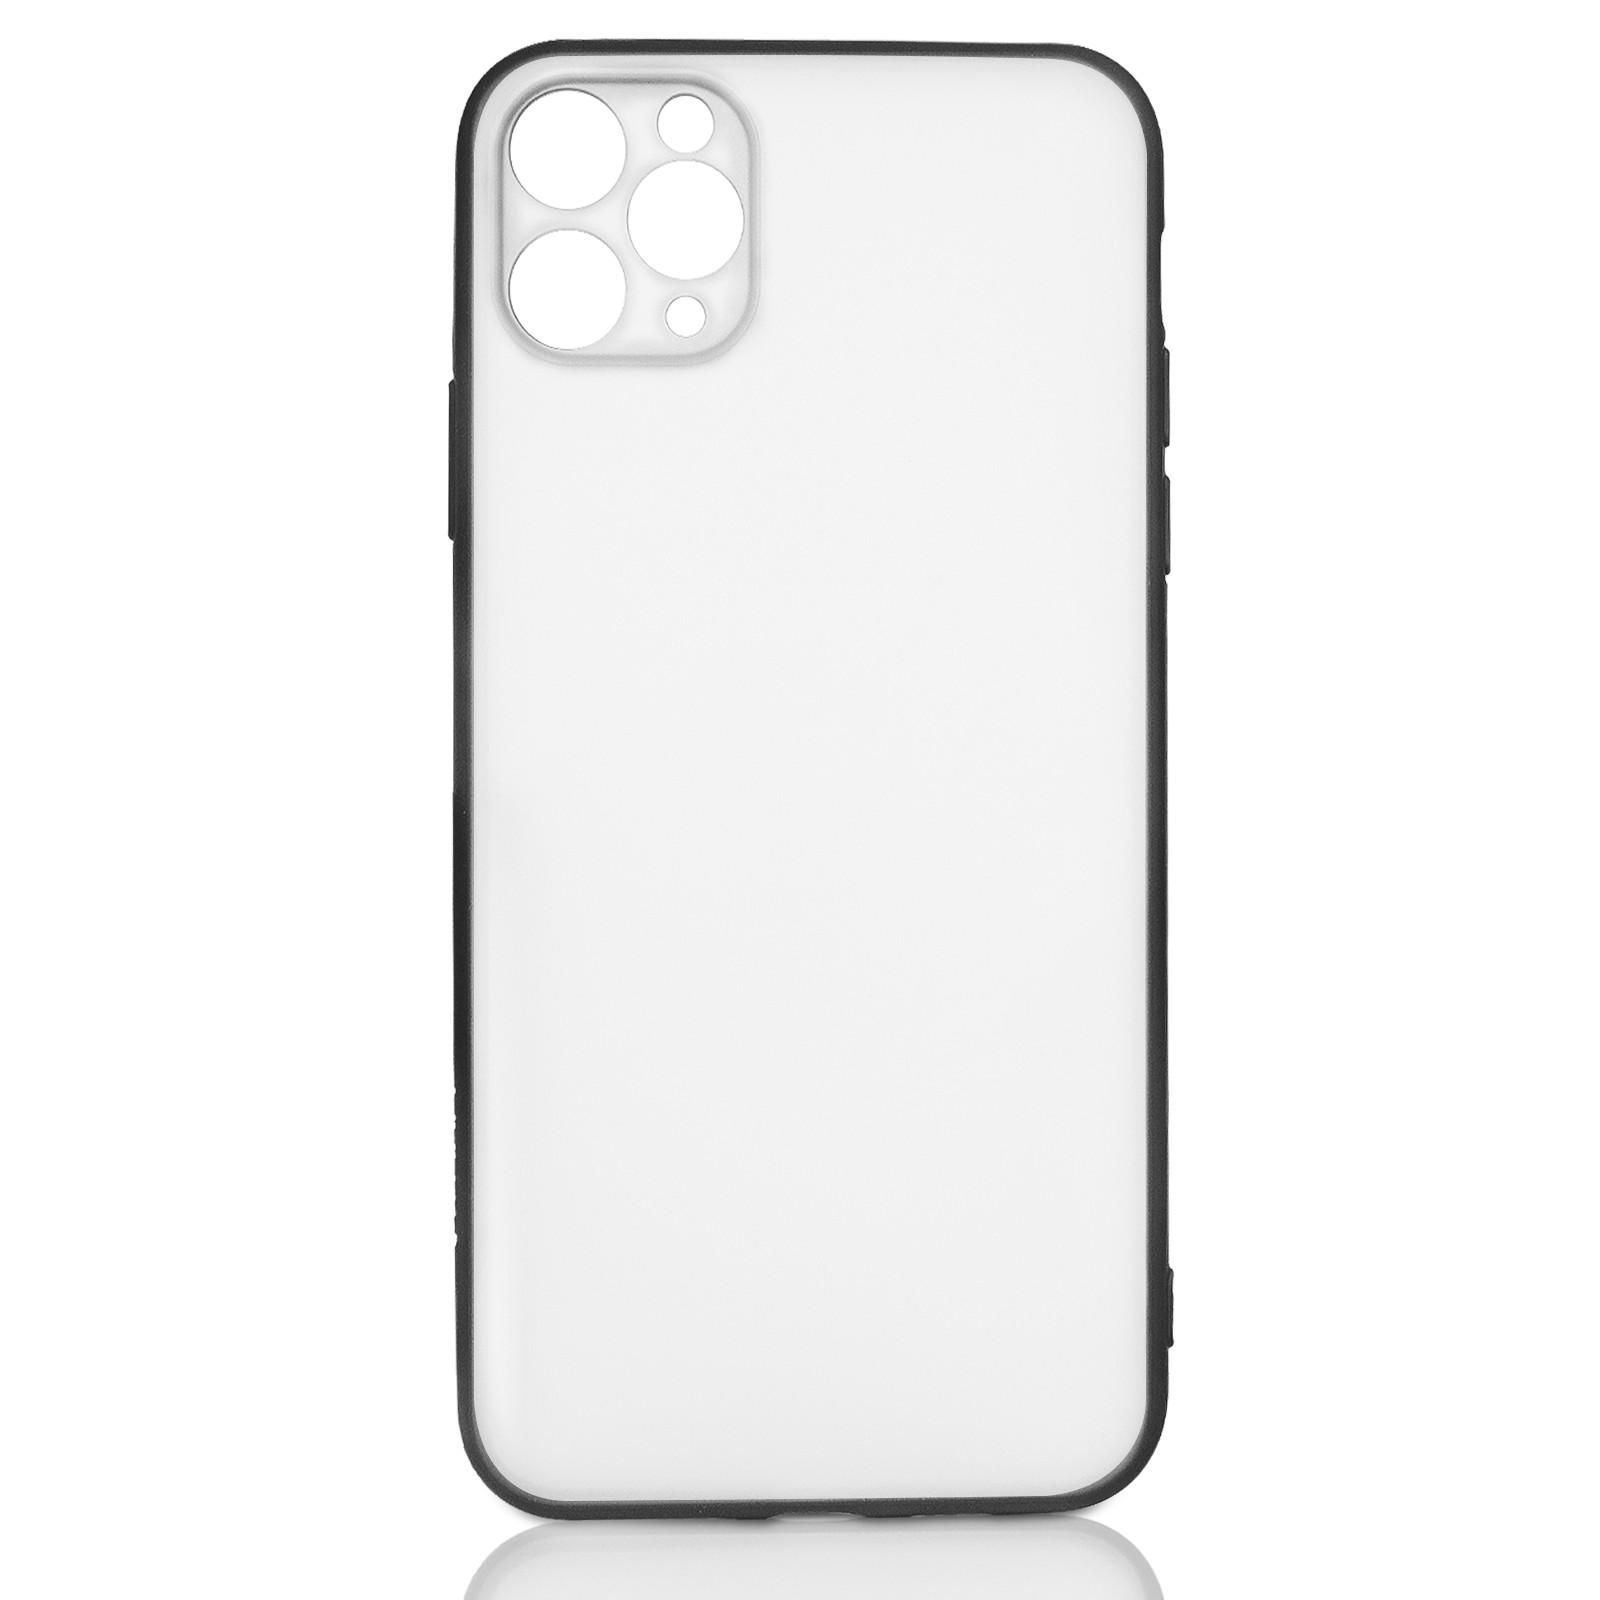 Capac protectie spate cellara colectia shade pentru iphone 11 pro max - negru